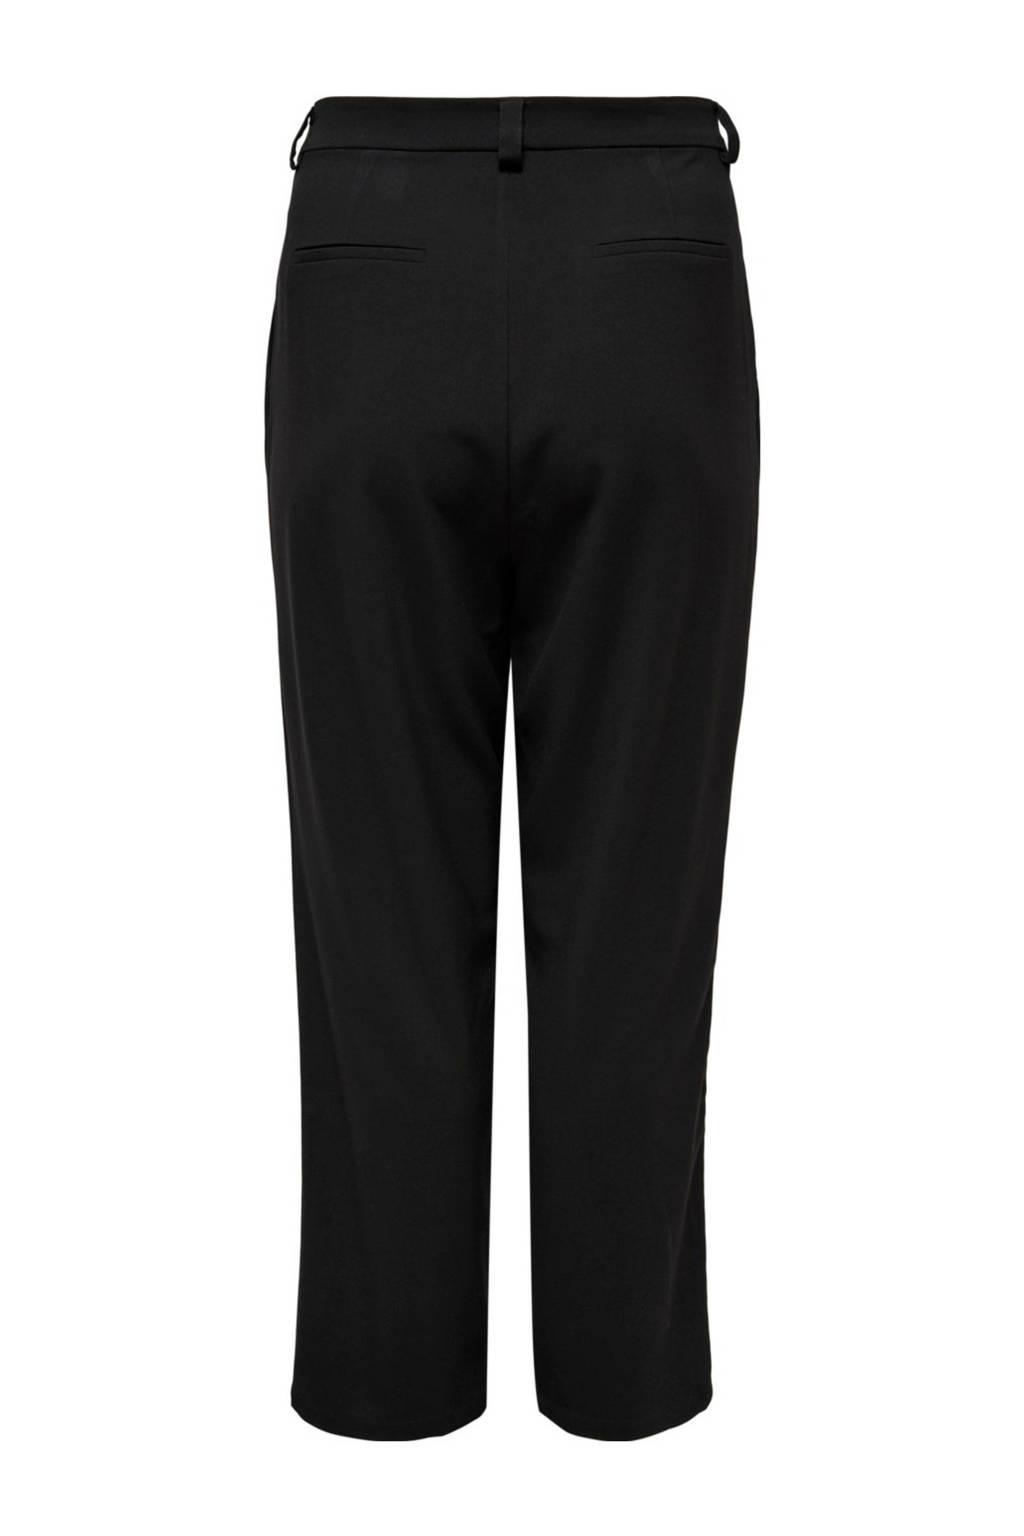 ONLY CARMAKOMA tapered fit broek zwart, Zwart